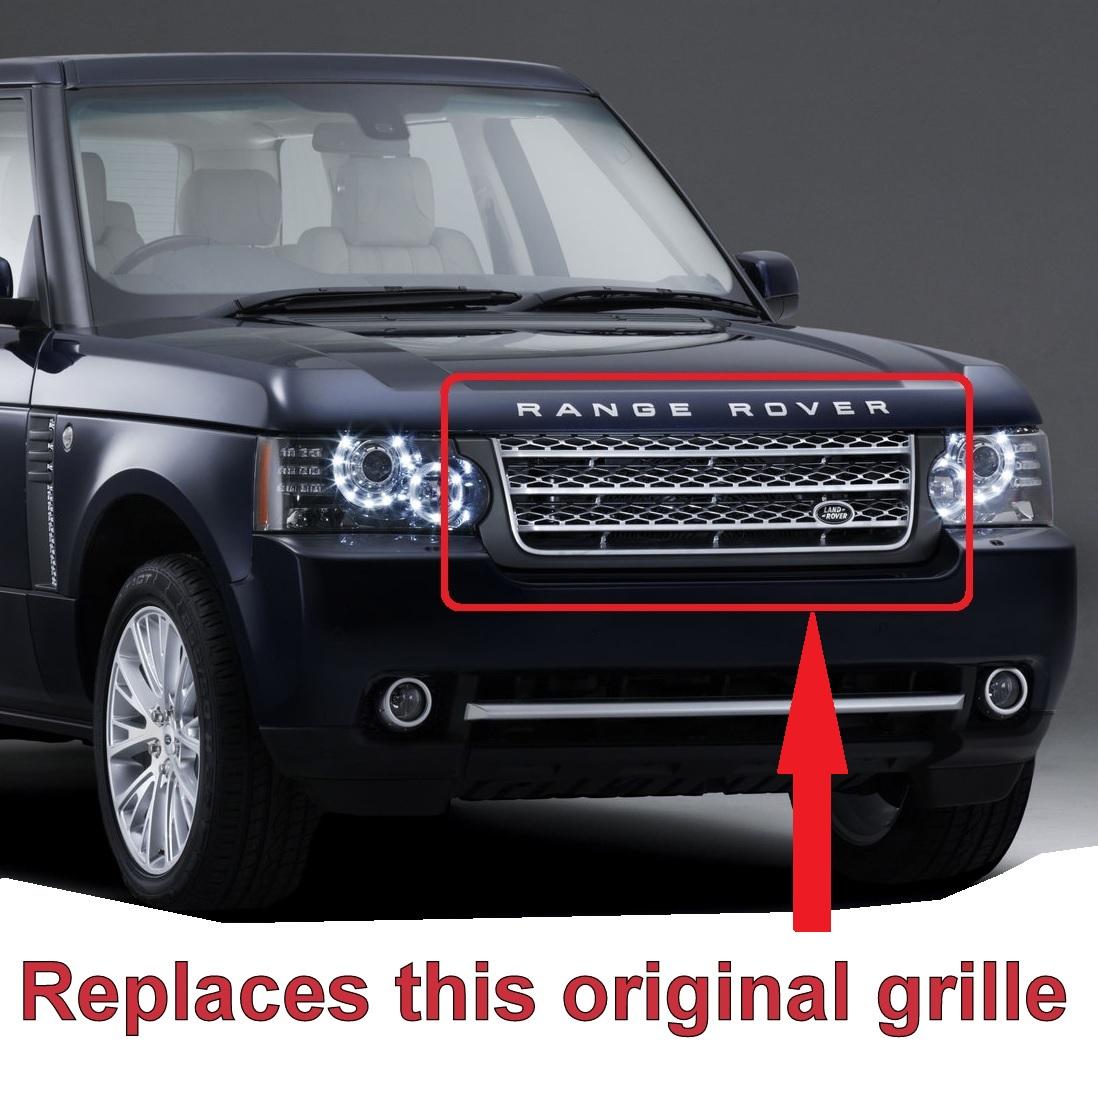 black silver l405 style front grille range rover l322 2010 12 exterior deisgn. Black Bedroom Furniture Sets. Home Design Ideas